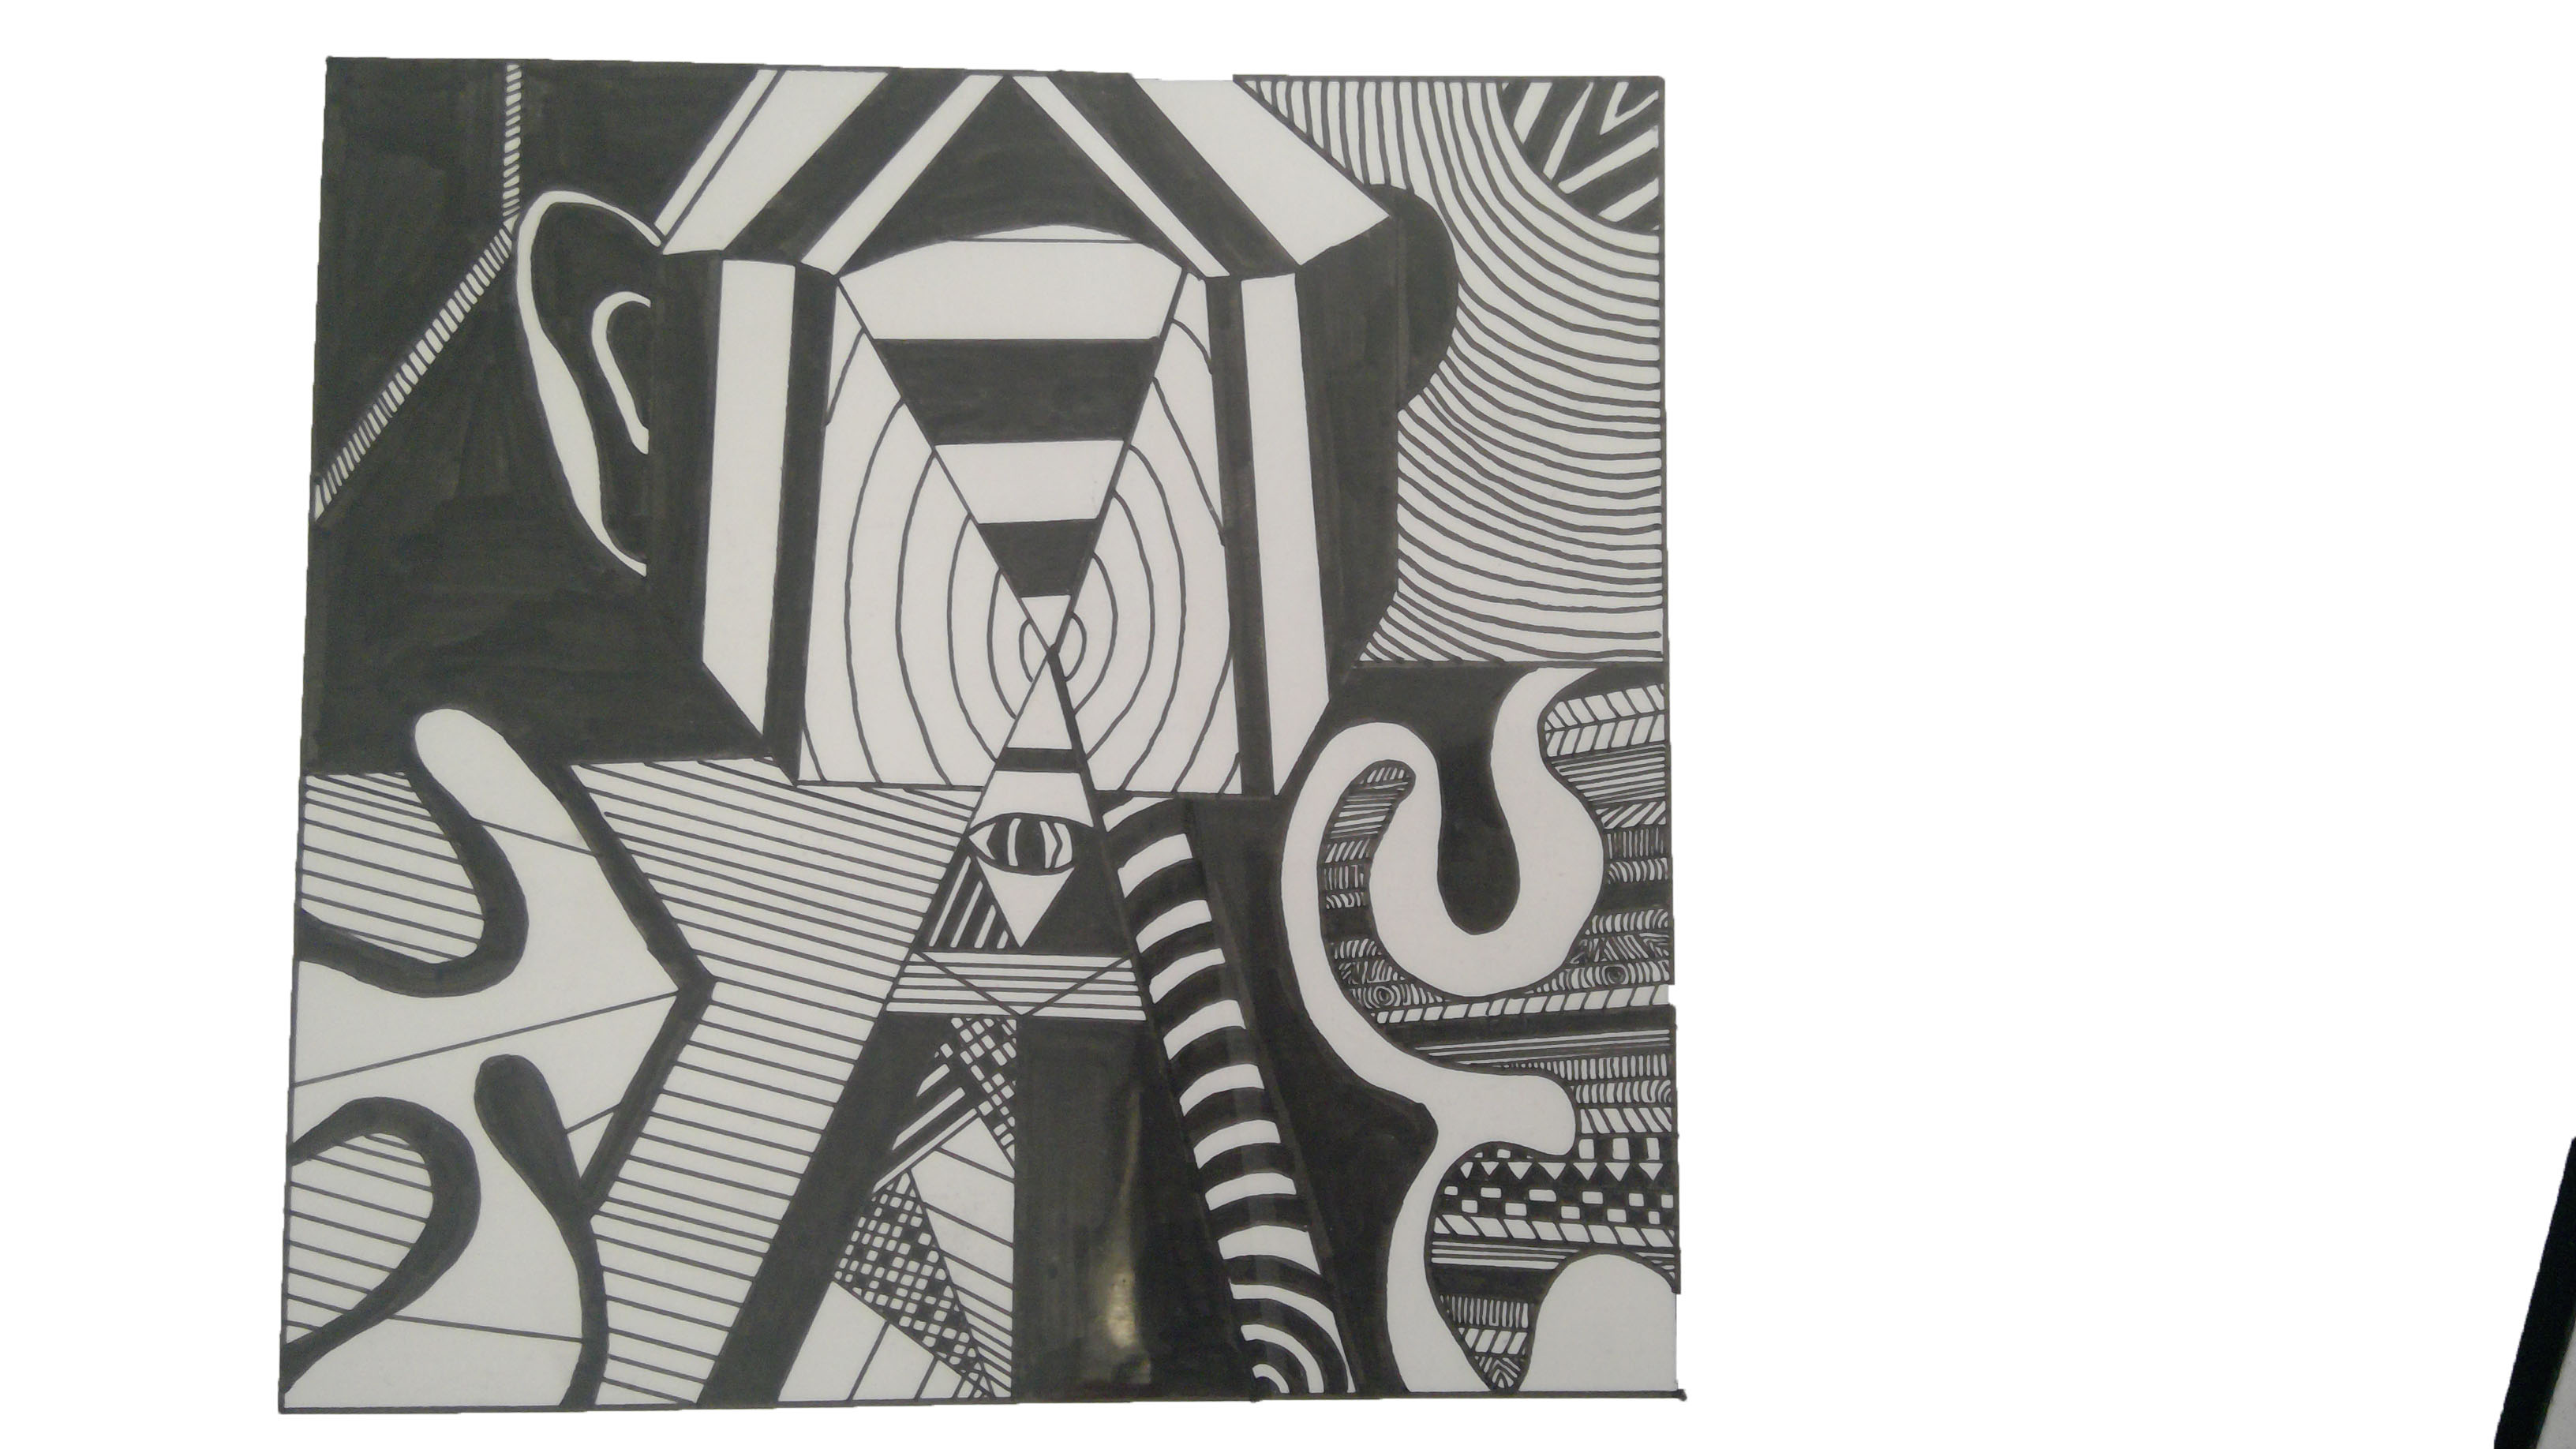 more hand drawn work